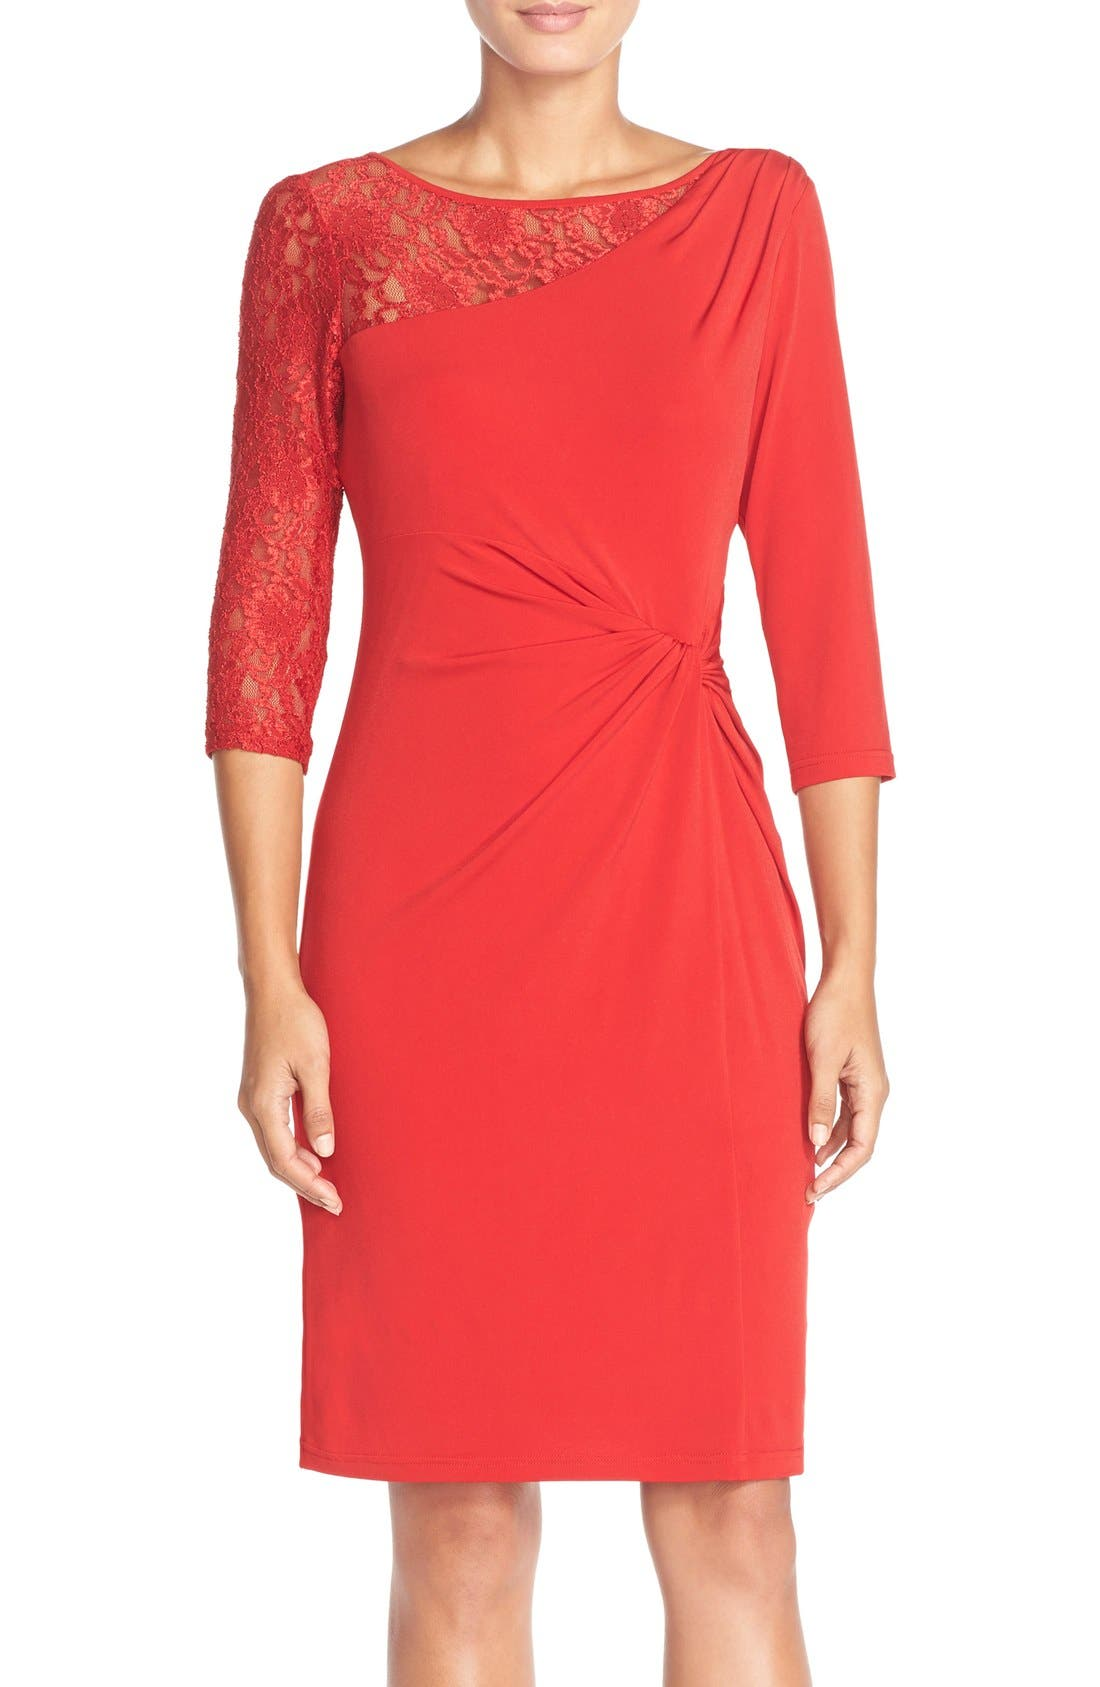 Alternate Image 1 Selected - Ellen Tracy Lace Sleeve Jersey Sheath Dress